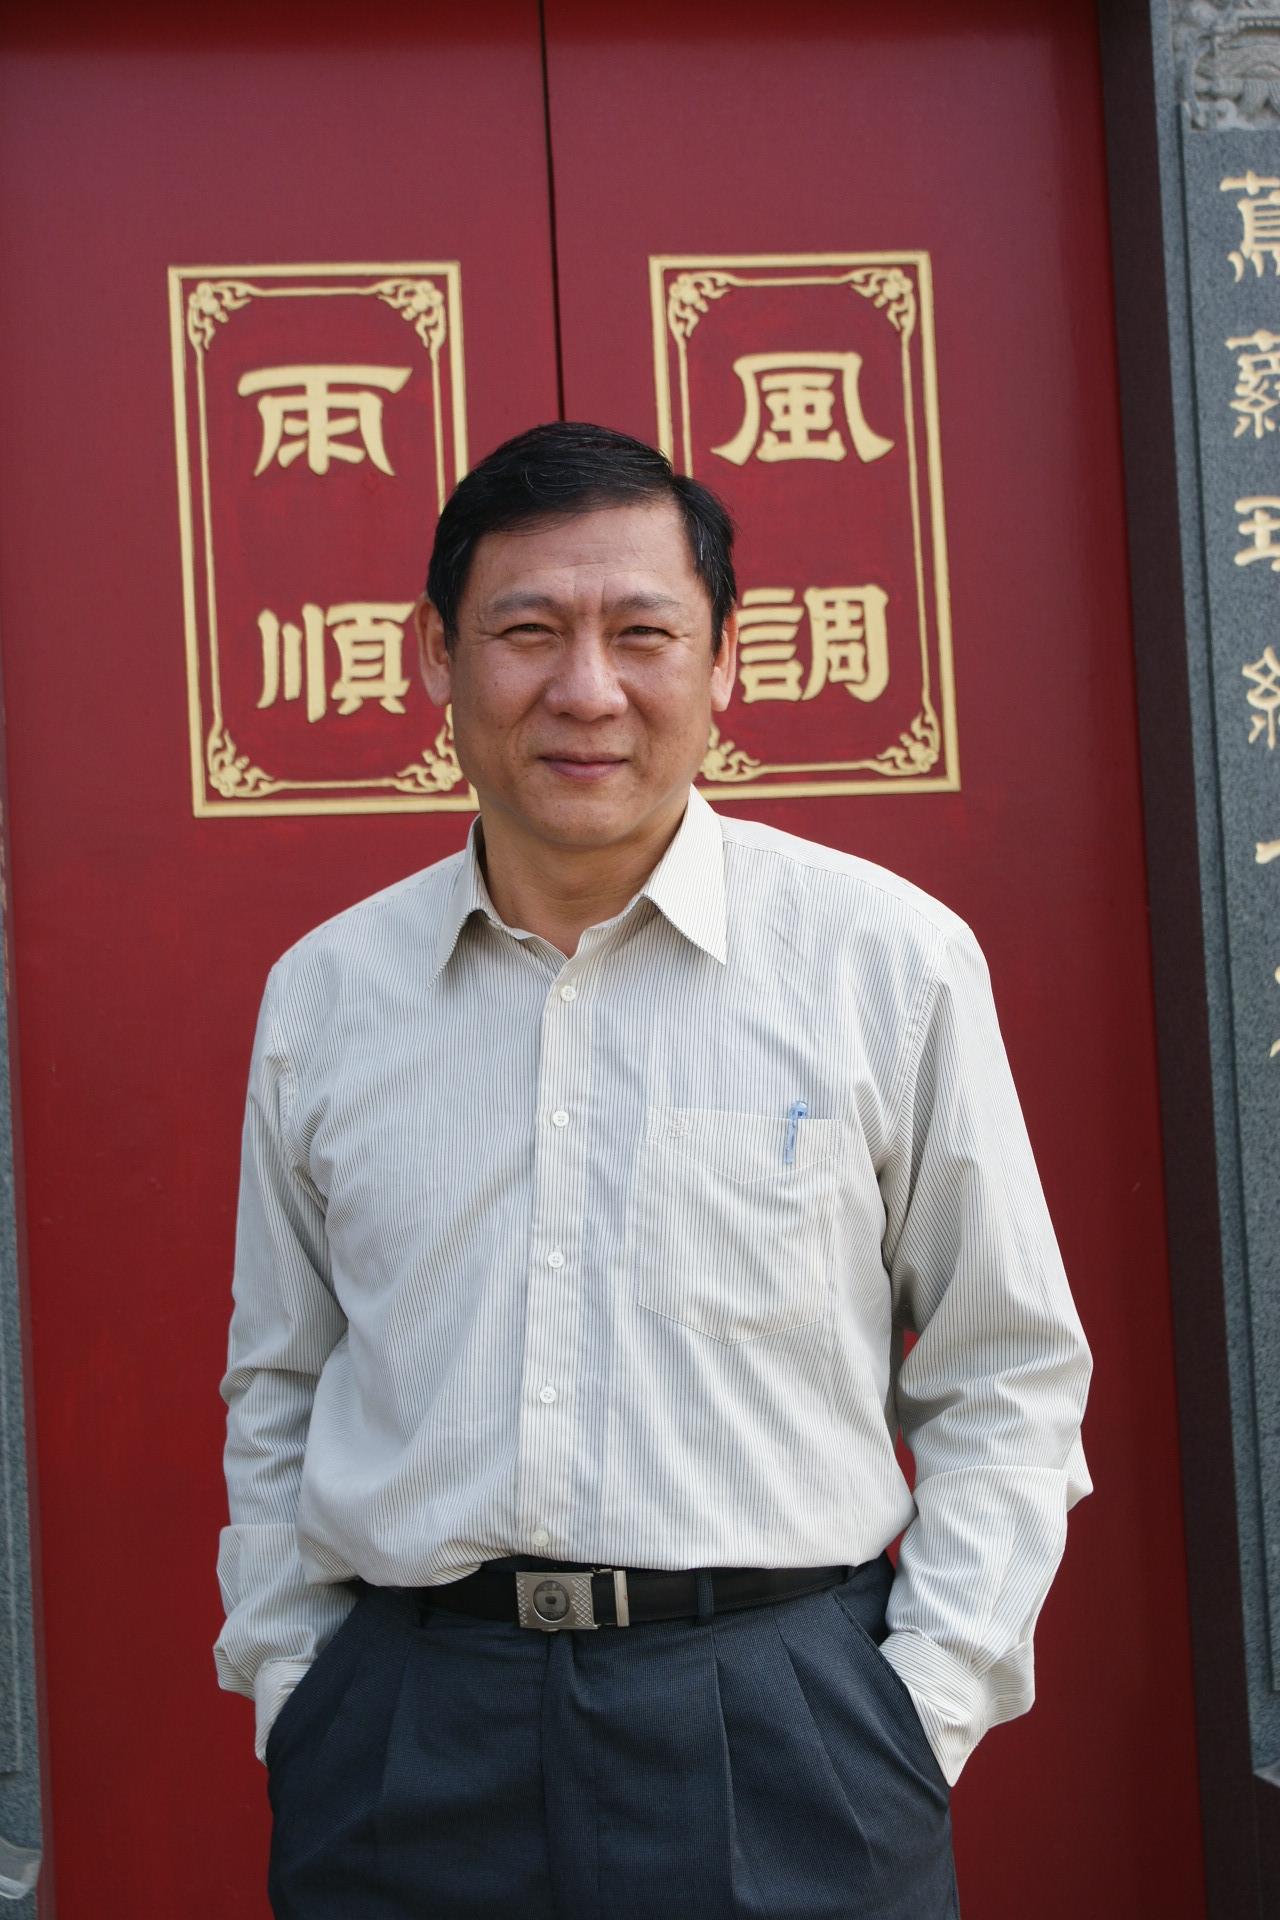 District Chief:Name: Hyun- Tsuen Lee Birth: 1960  Inauguration date: December 25, 2014